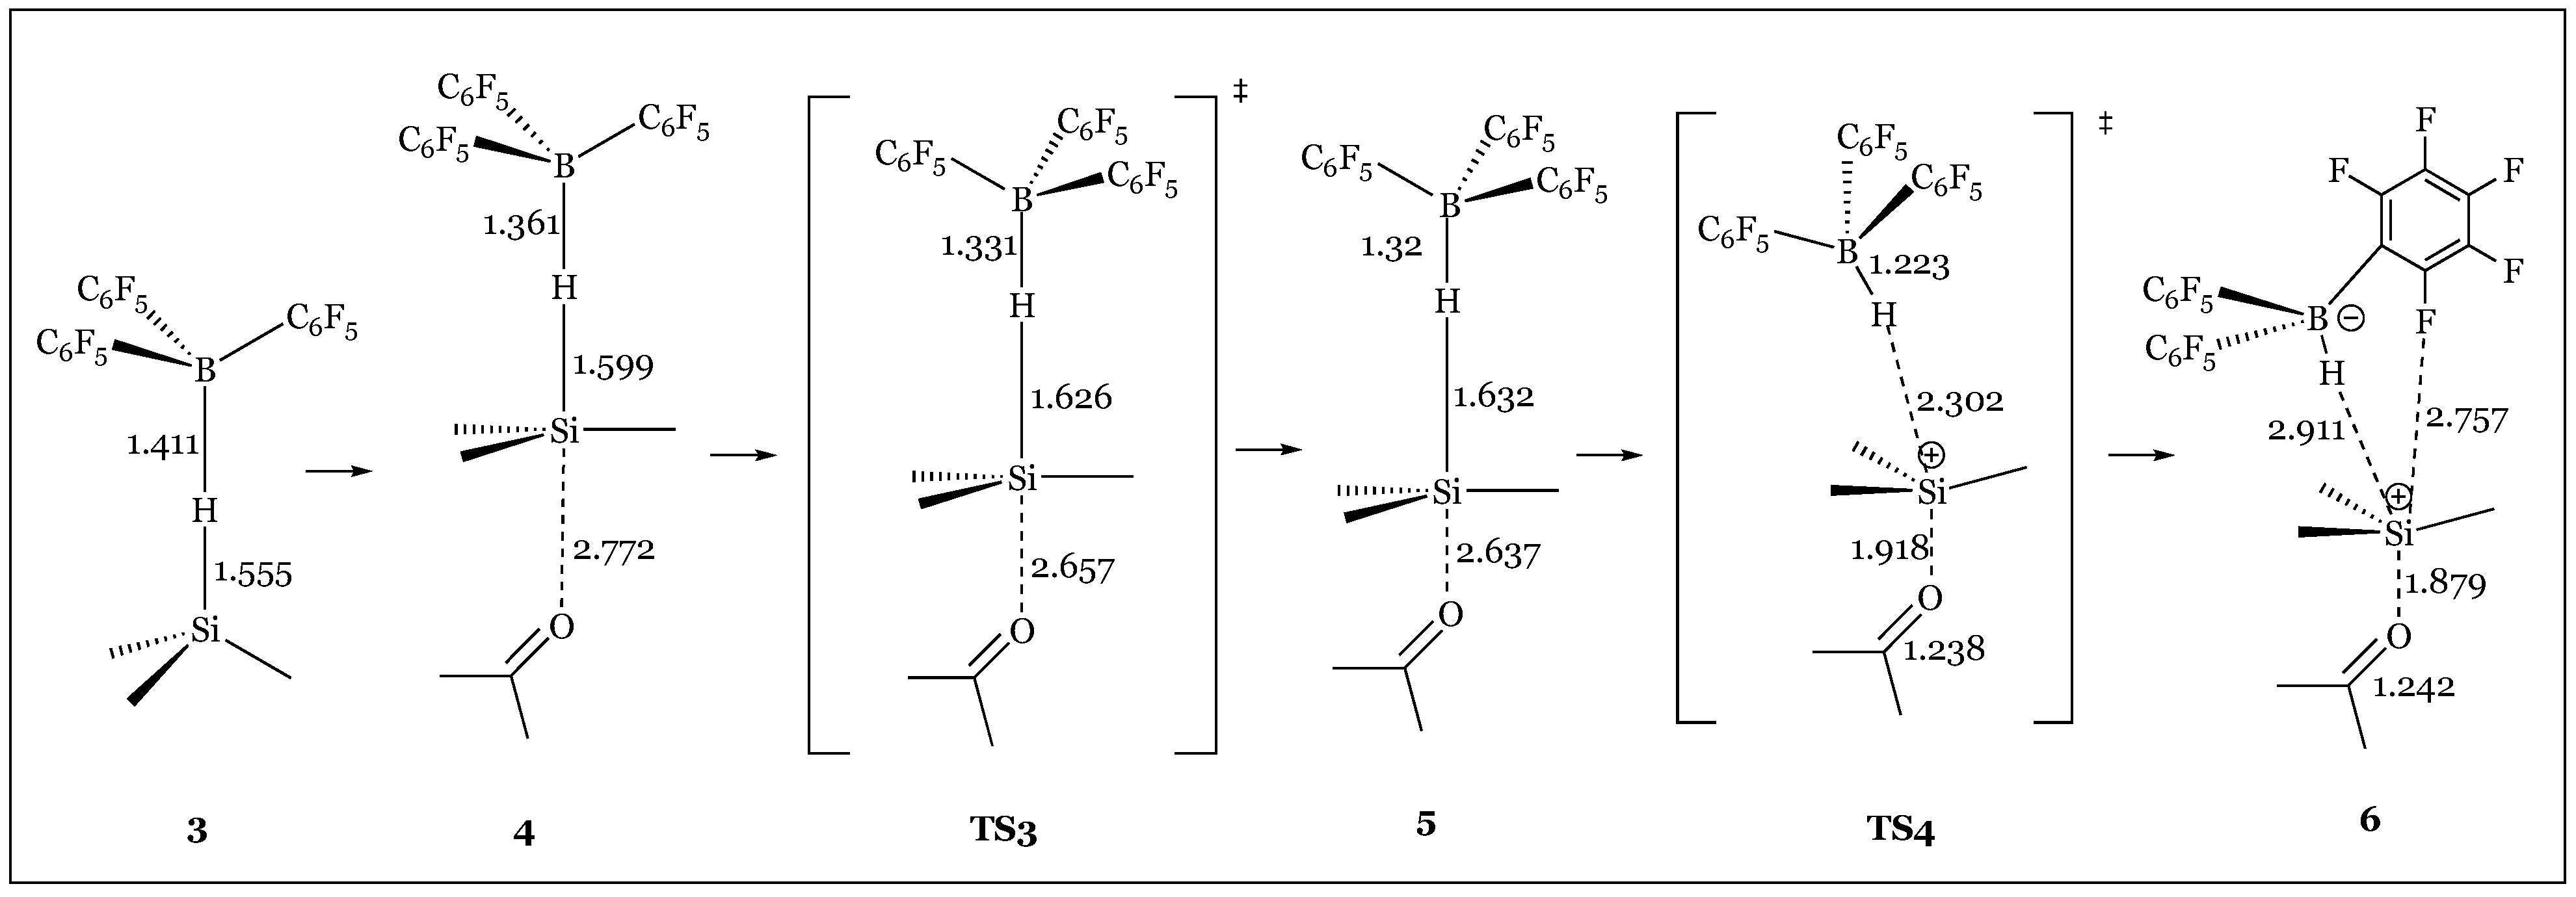 Molecules | Free Full-Text | Tris(pentafluorophenyl)borane